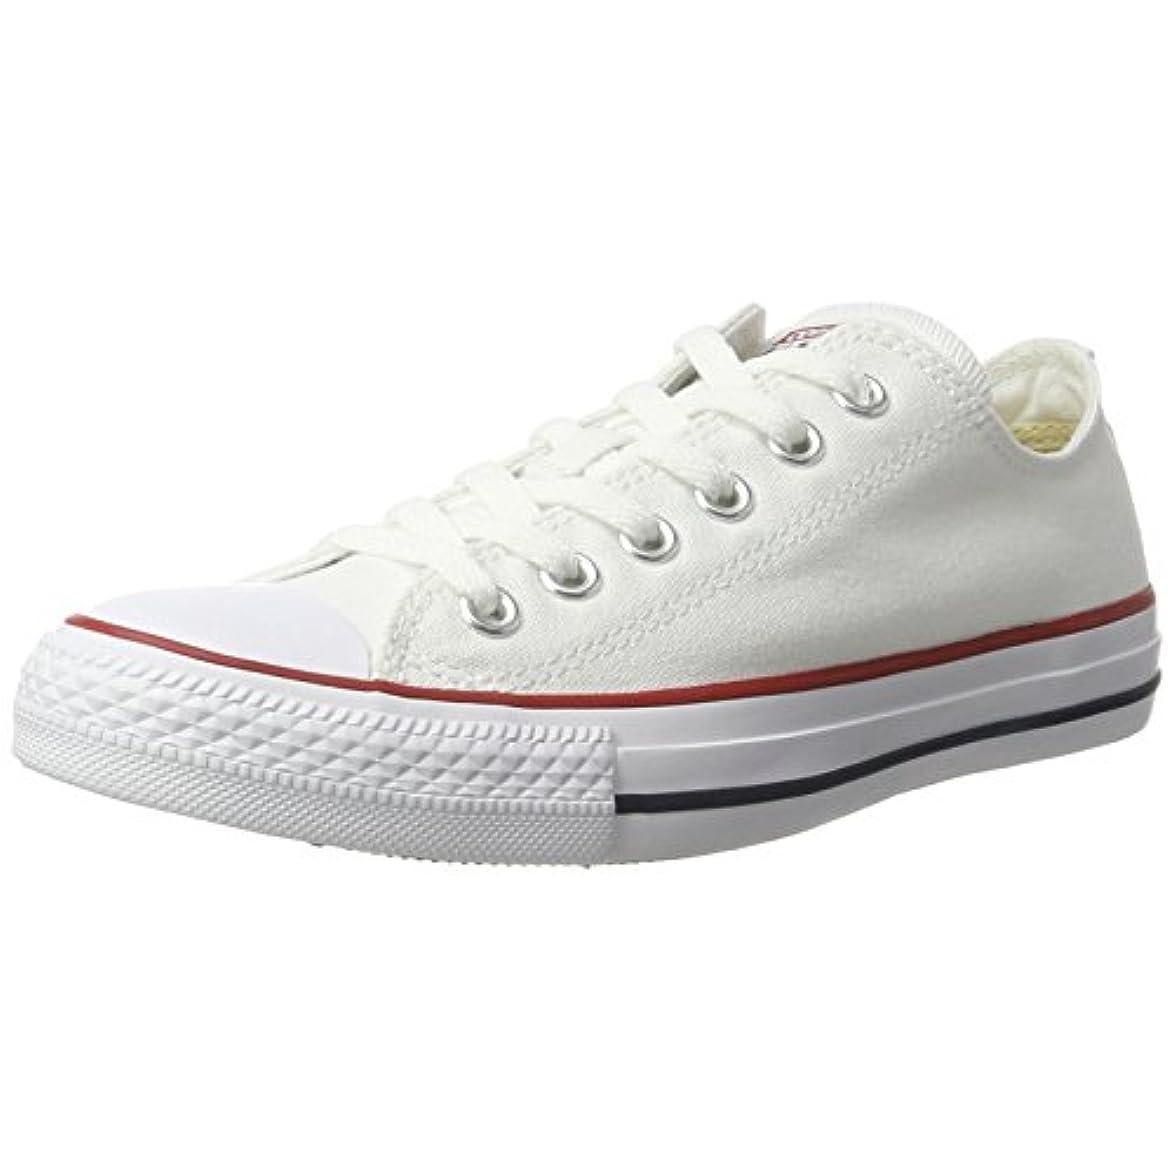 Converse Chuck Taylor All Star Sneakers Basse Unisex Da Adulto Bianco